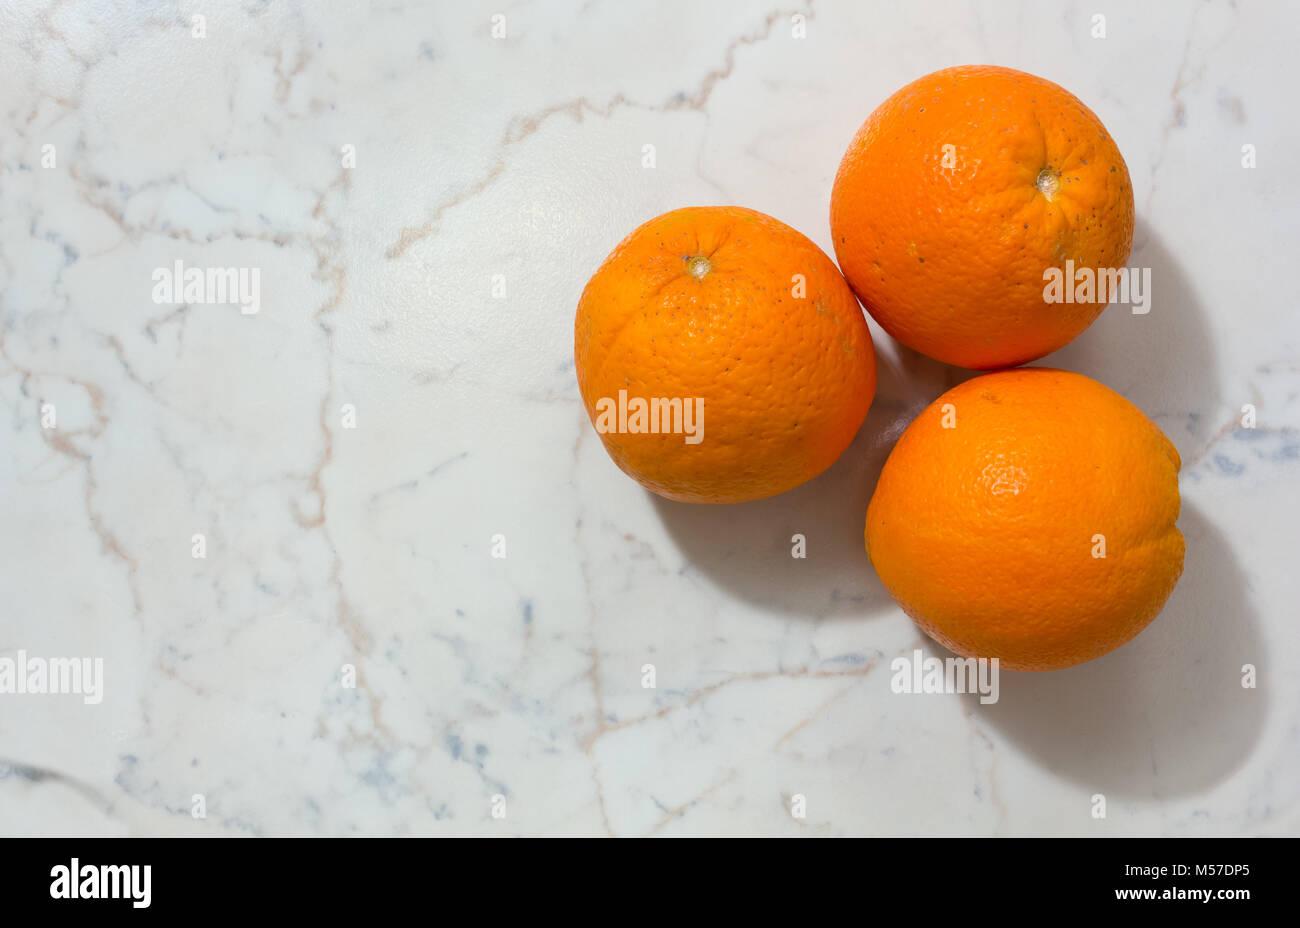 Three oranges on a white marble-like background - Stock Image